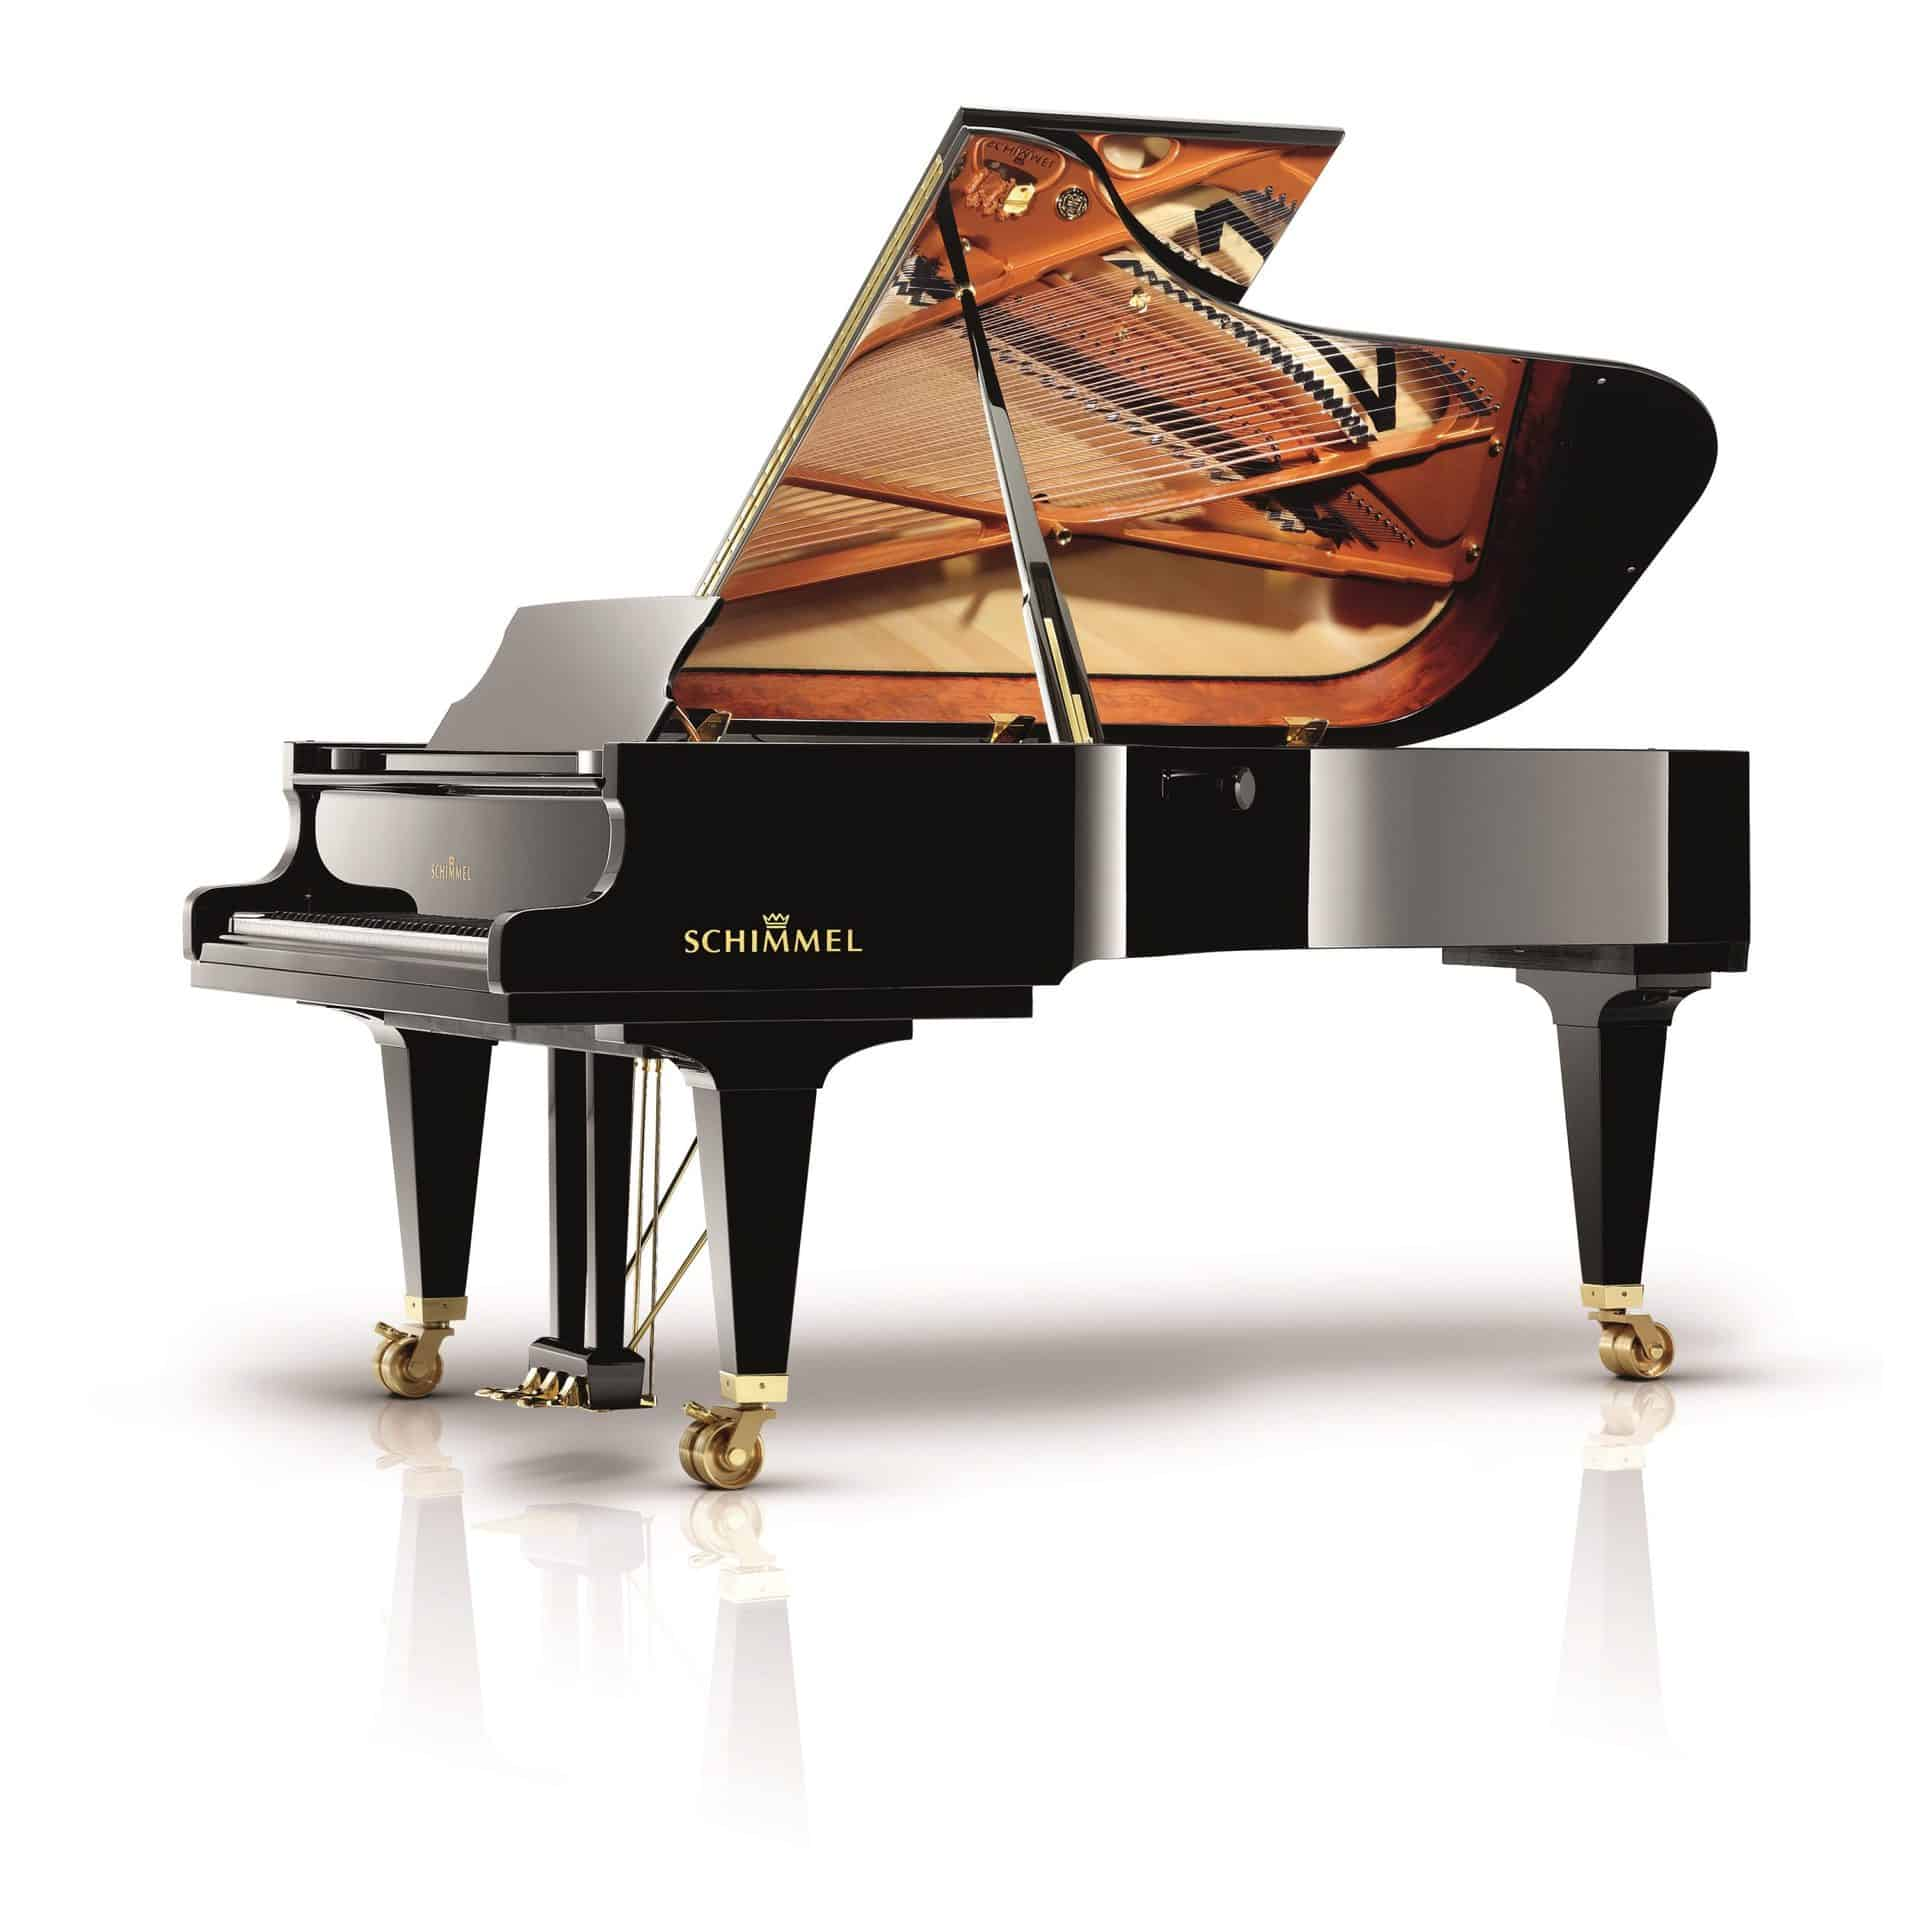 Schimmel K280 Grand Piano